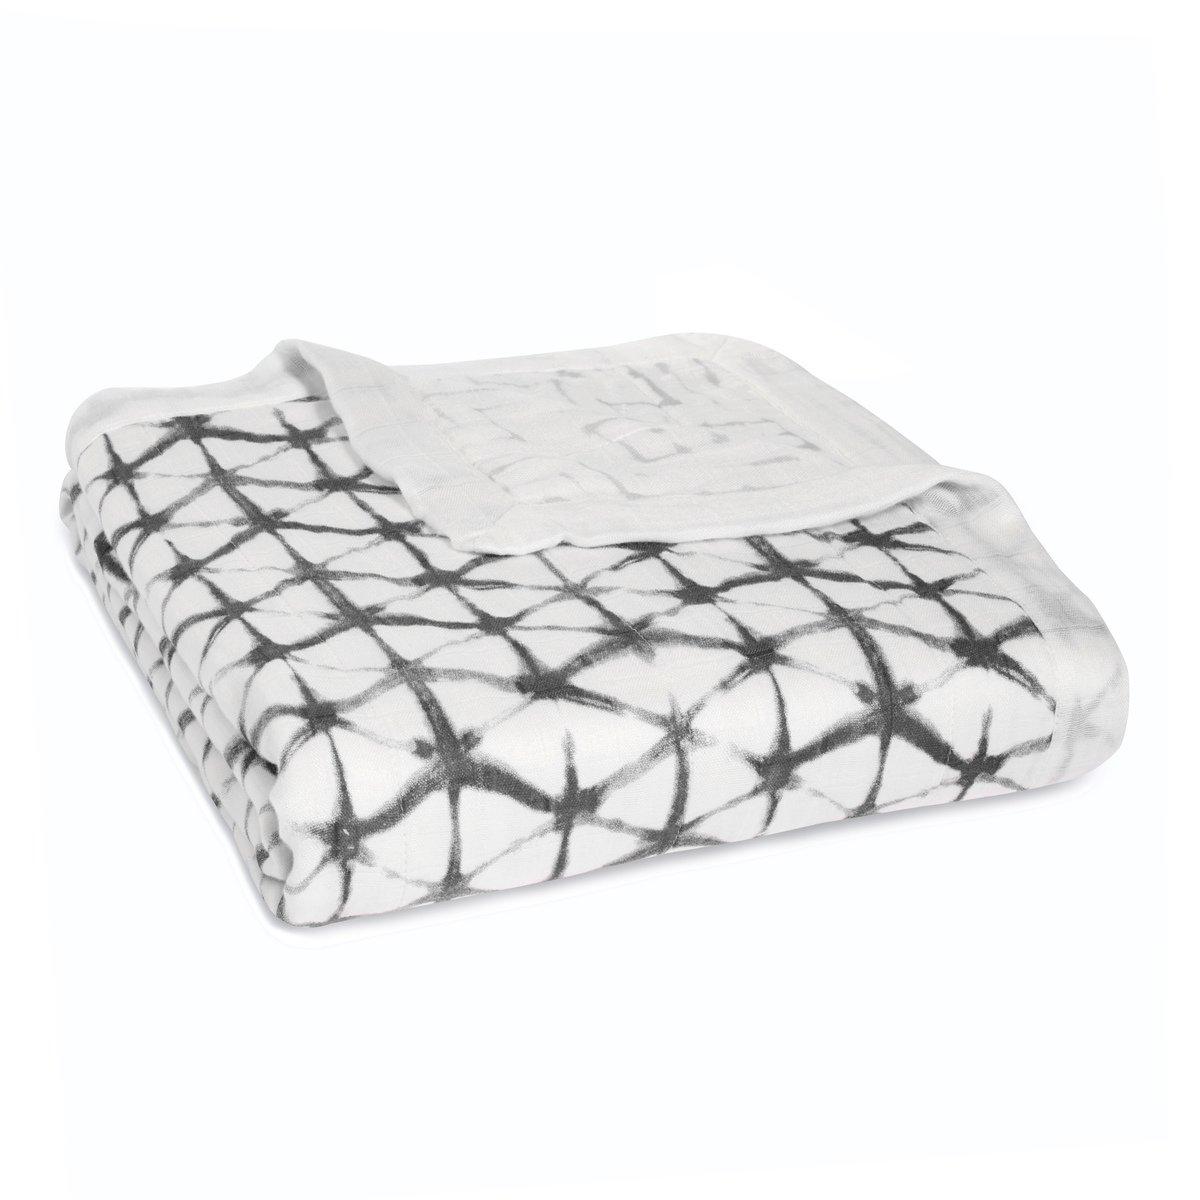 aden + anais Silky Soft Dream Blanket, Meadowlark 9316F